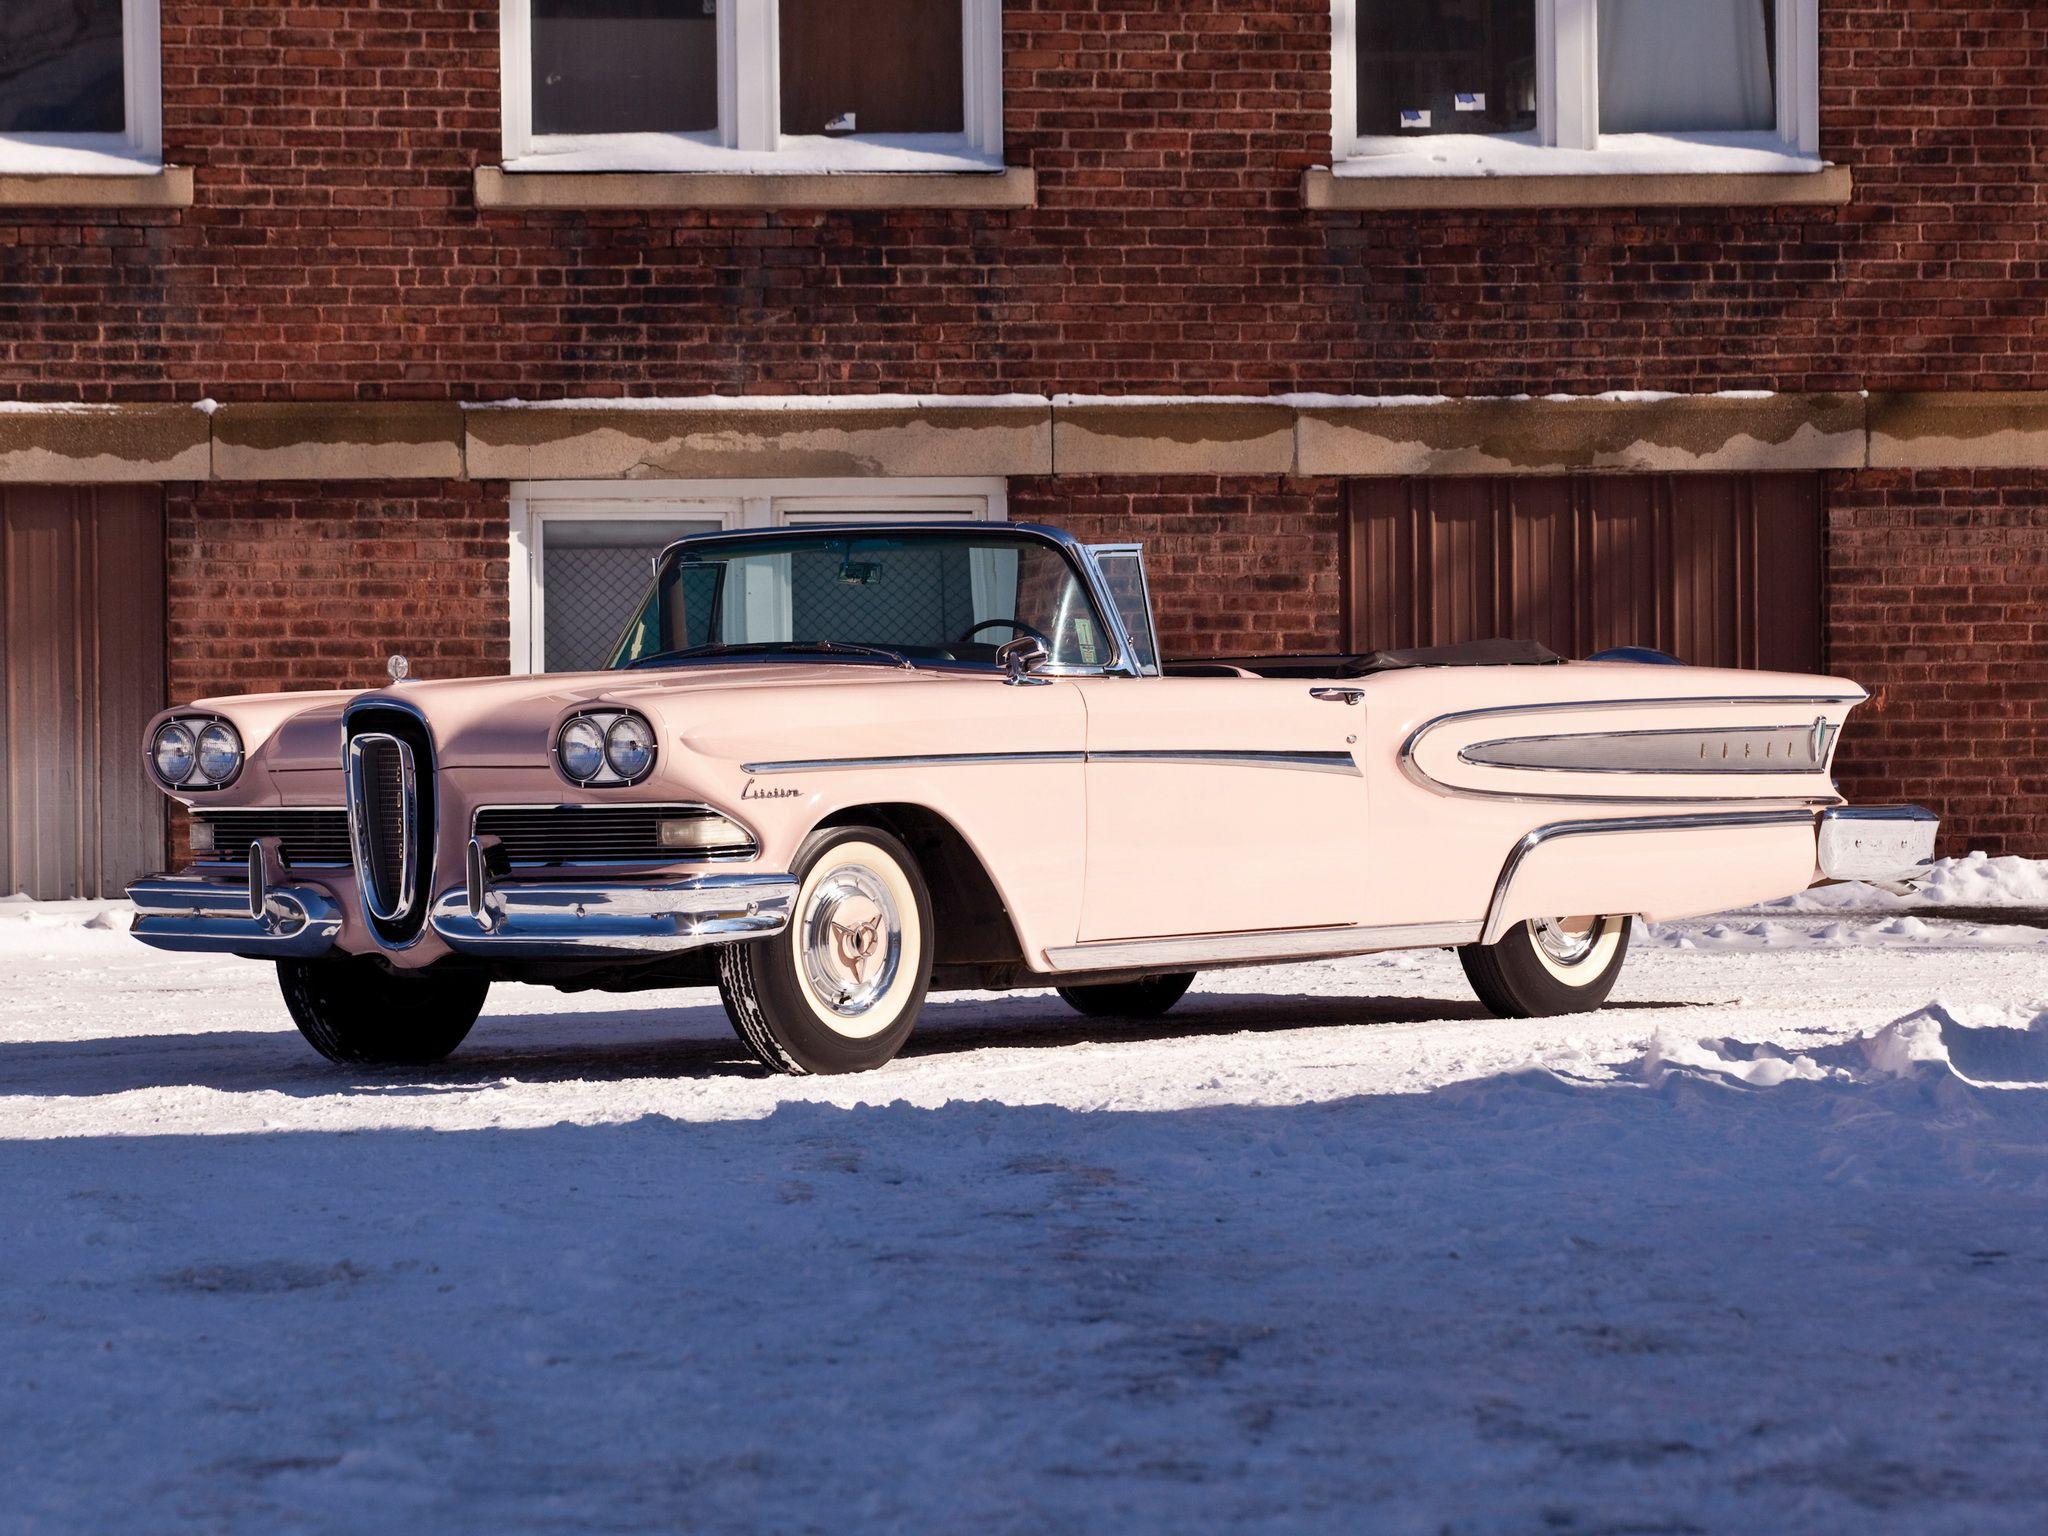 1958 edsel citation 2 door convertible 1951 to 1959 carz. Black Bedroom Furniture Sets. Home Design Ideas